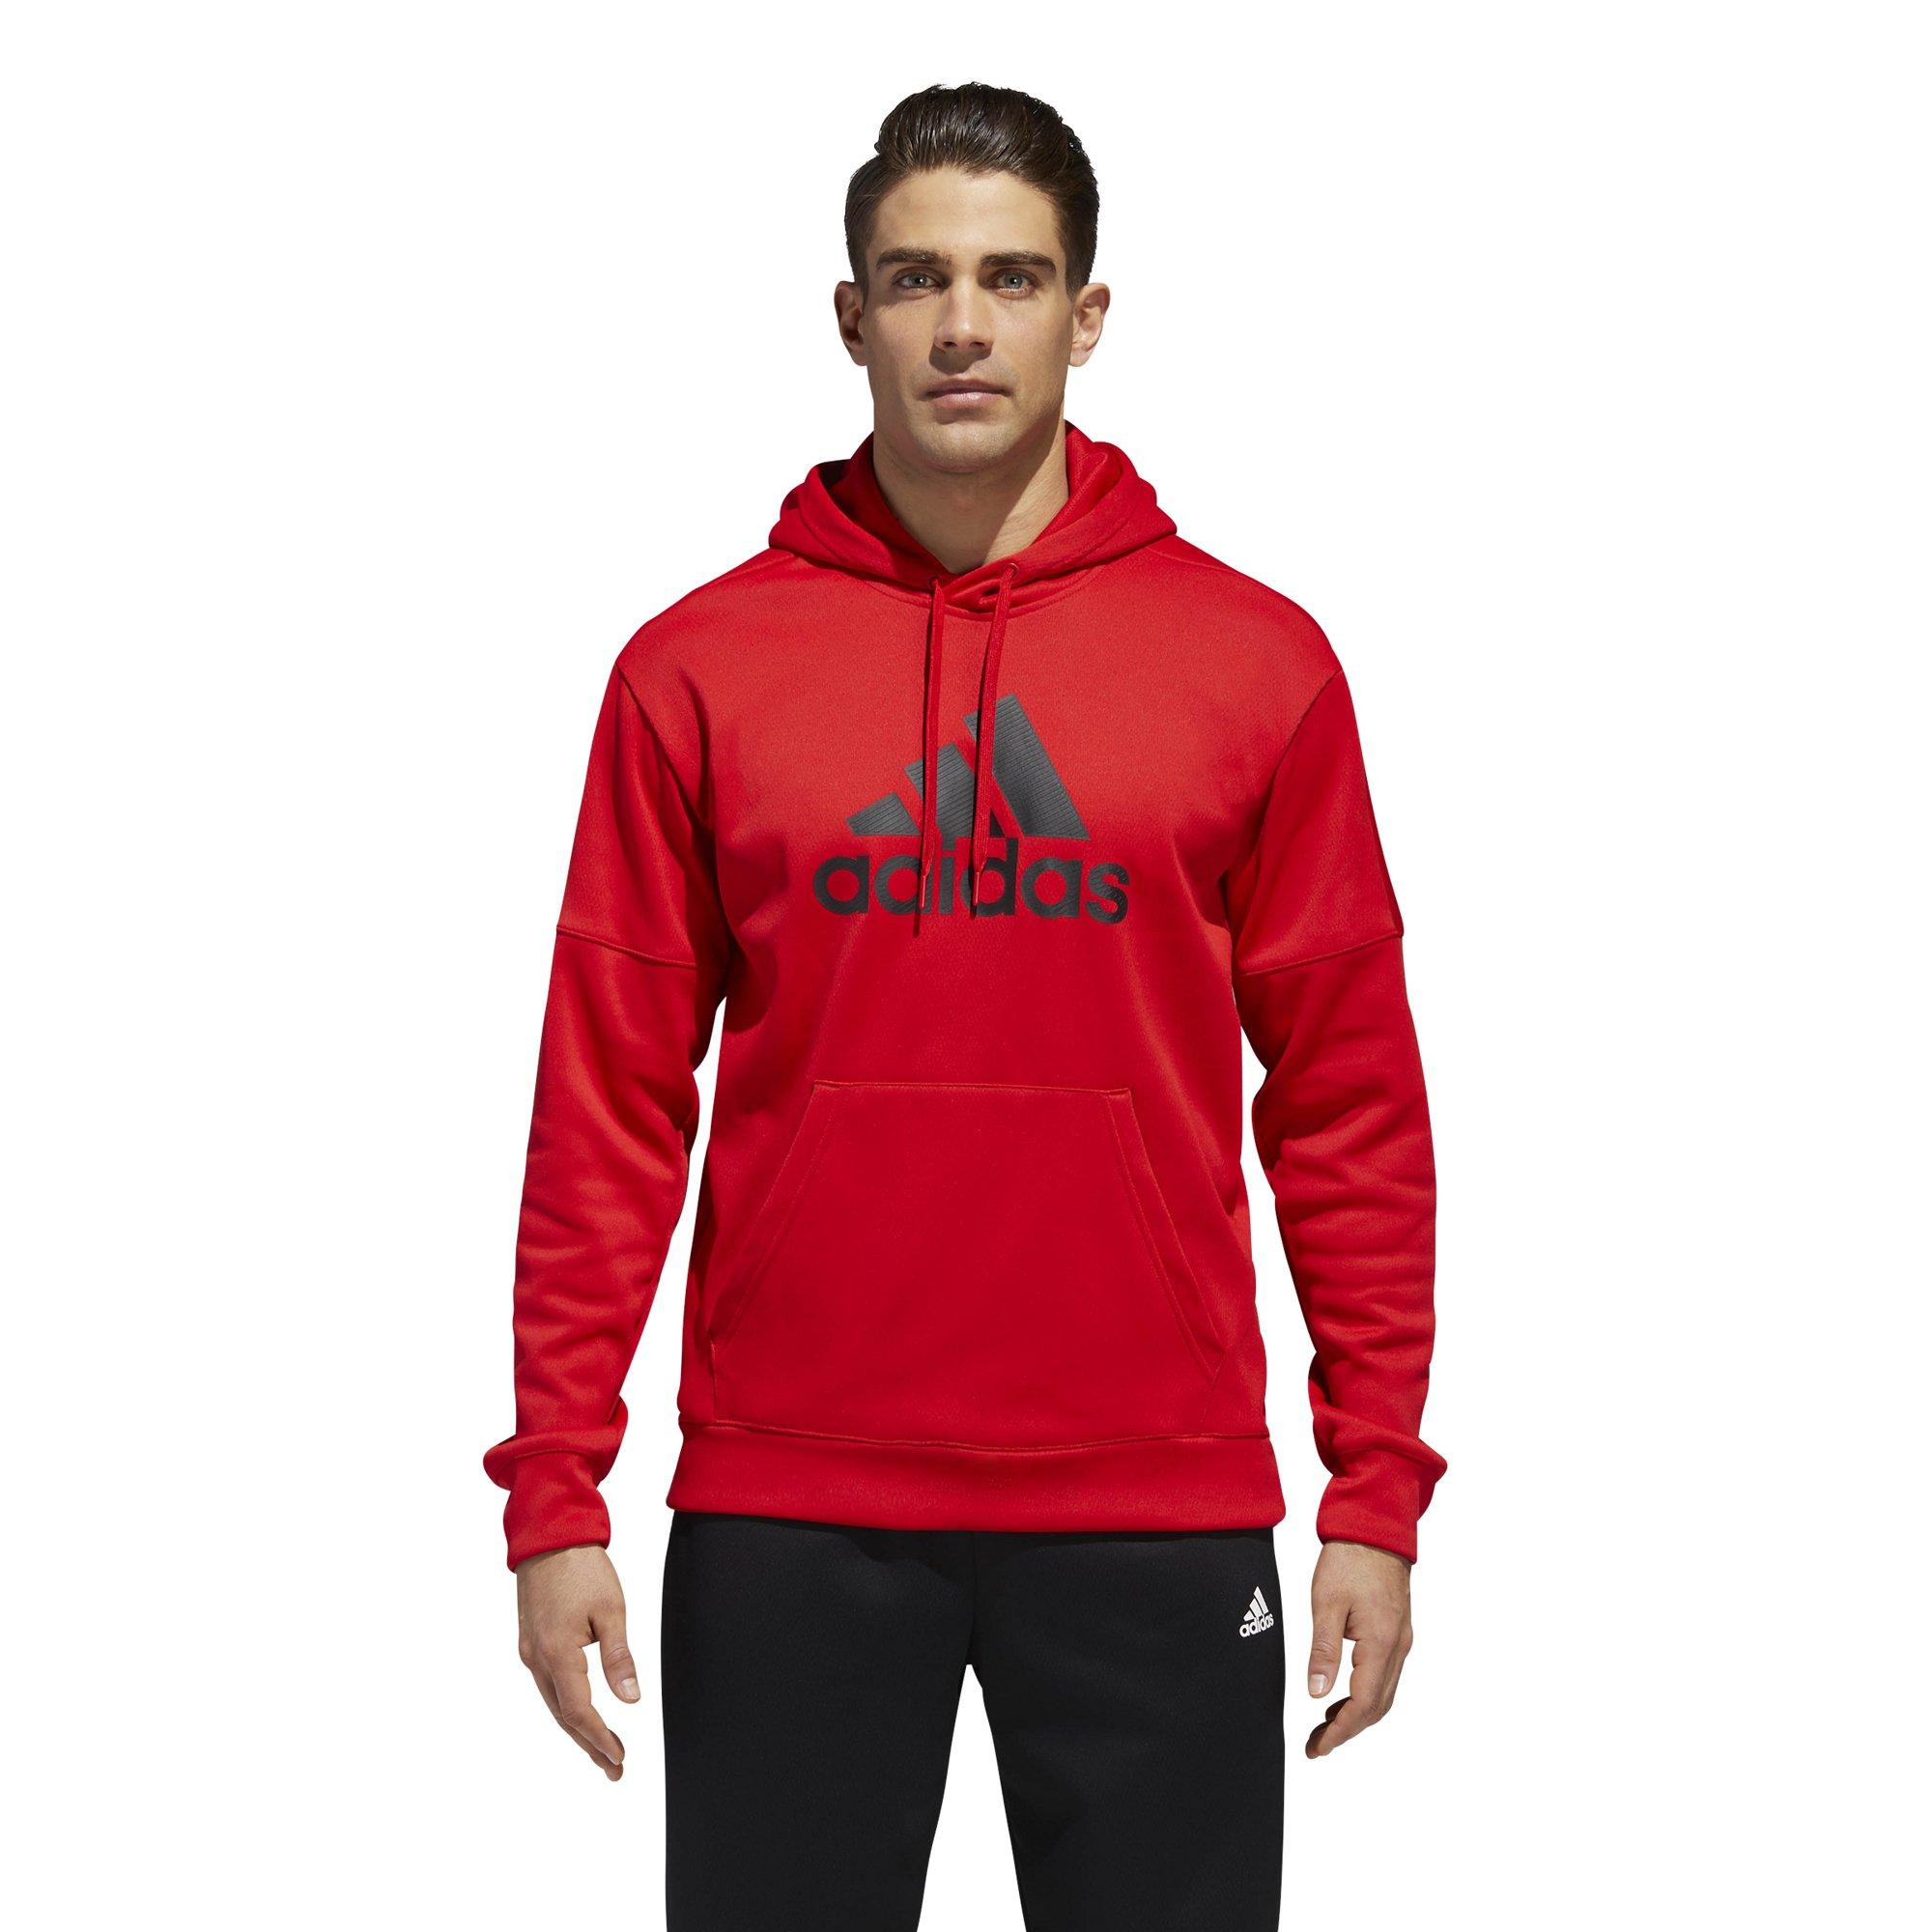 adidas Men's Athletics Team Issue Full-Zip Fleece Hoodie, Scarlet, Large by adidas